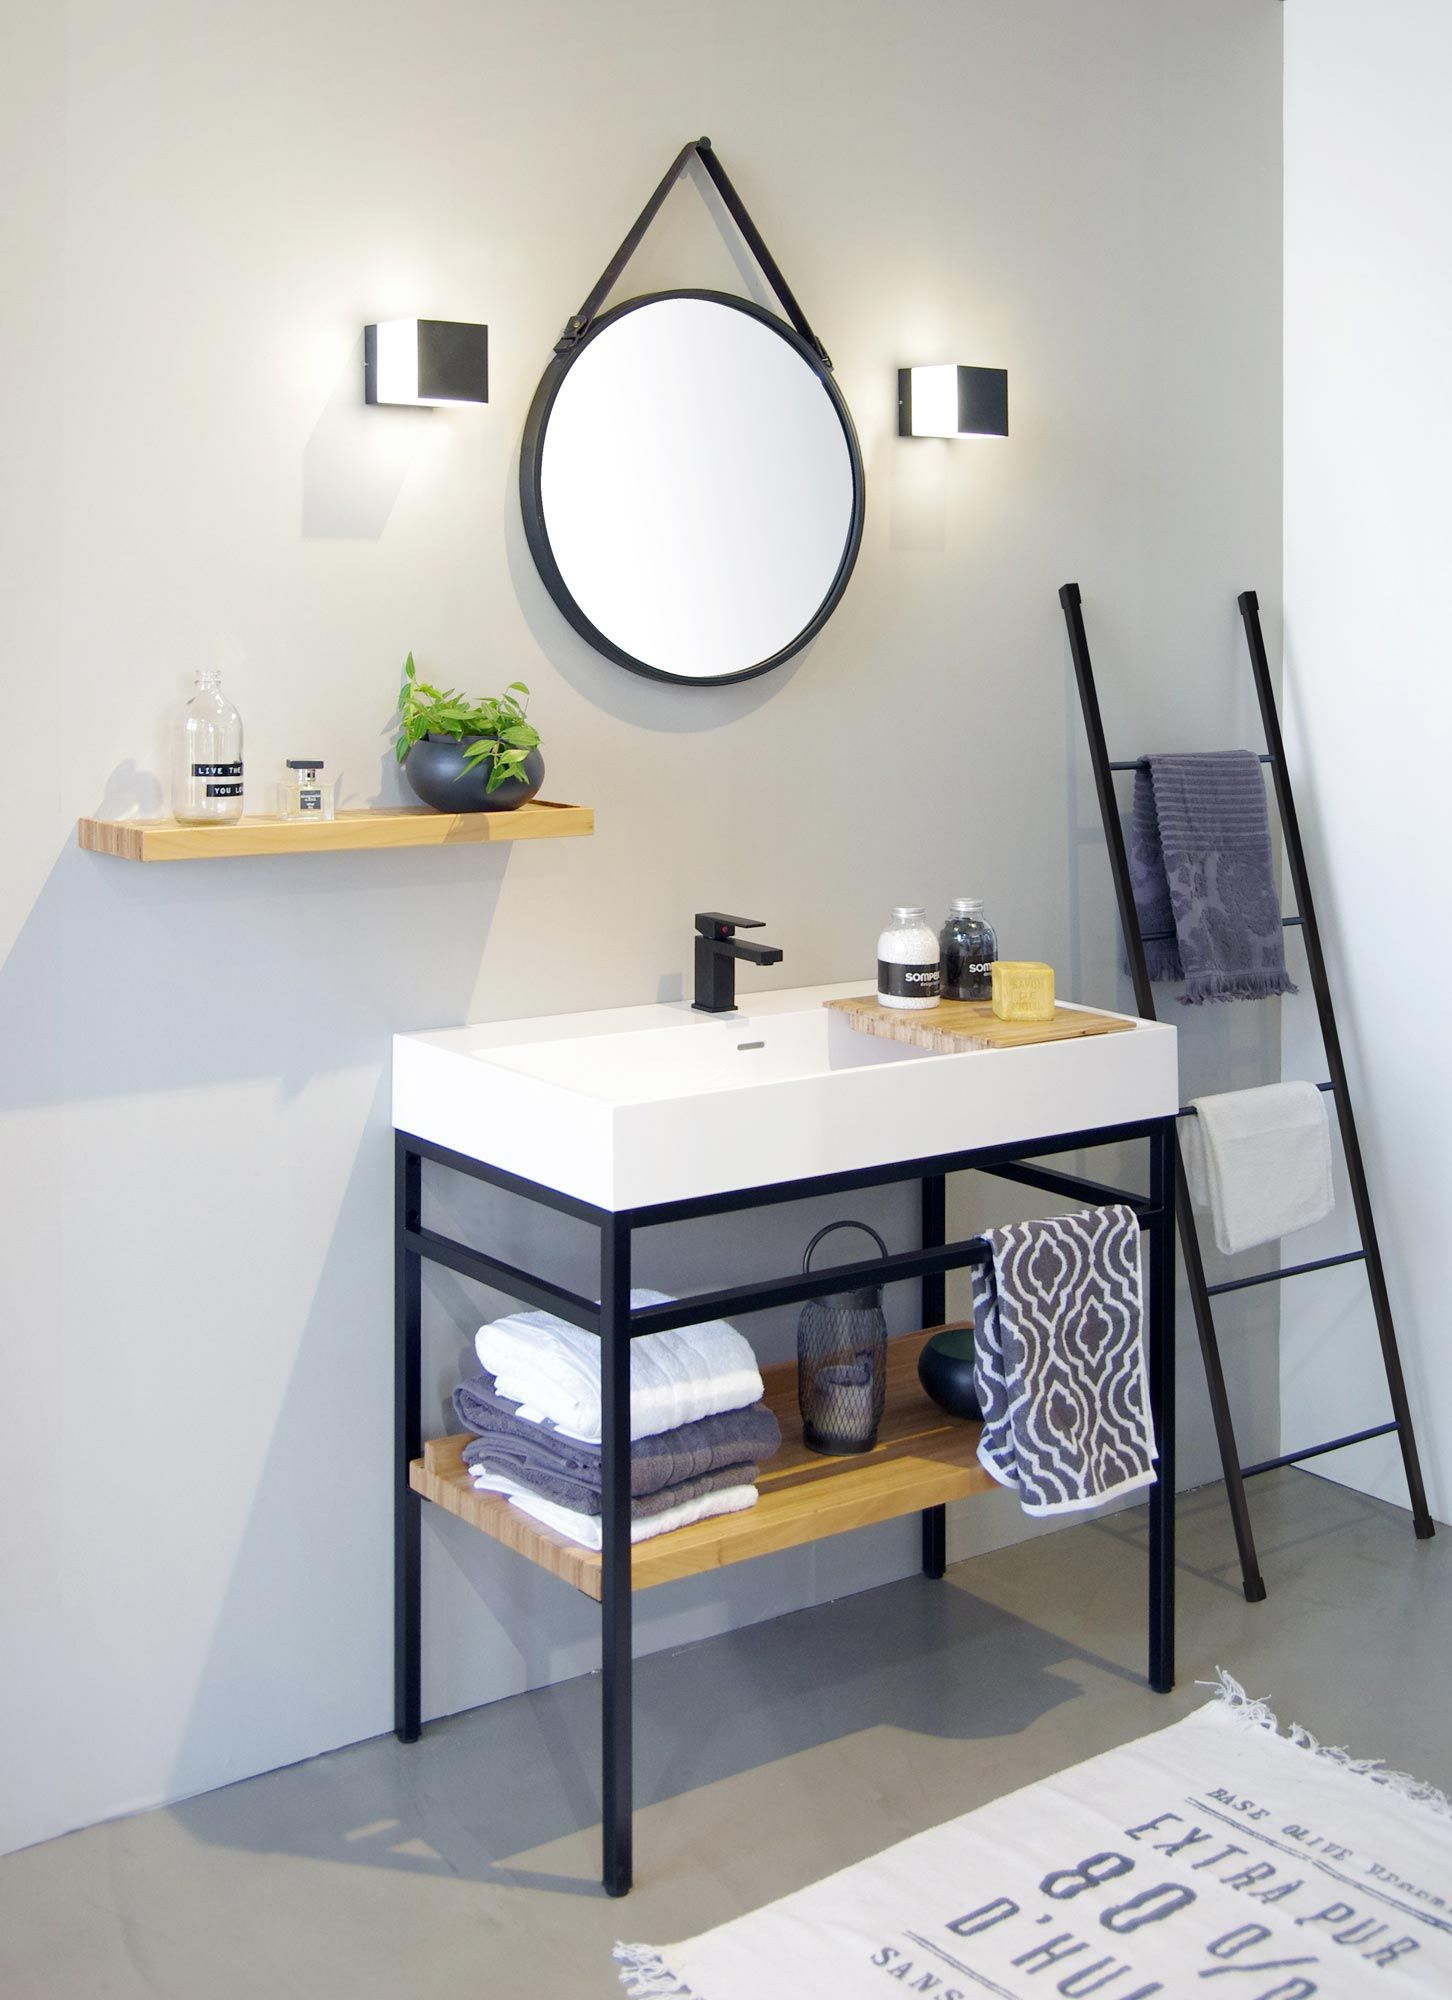 Steel meubles de salle de bains baignoires fabricant - Fabricant meuble de salle de bain ...